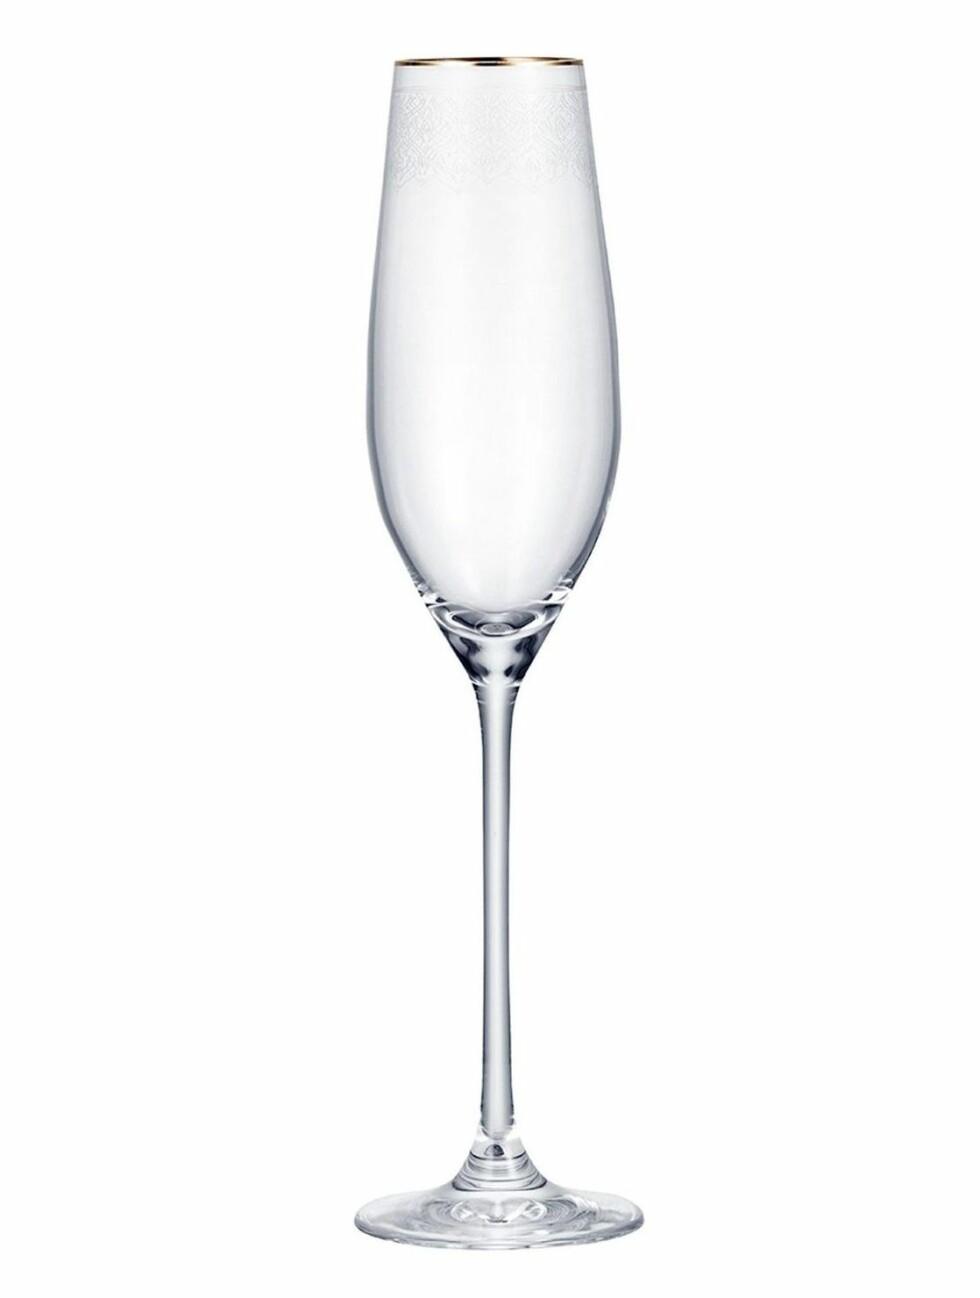 Champagneglass fra Indiska  99,-  https://indiska.com/no/Interi%C3%B8r/Glass-%26-porselen/Glass/SARRAH-CHAMPAGNE/p/1000006969089